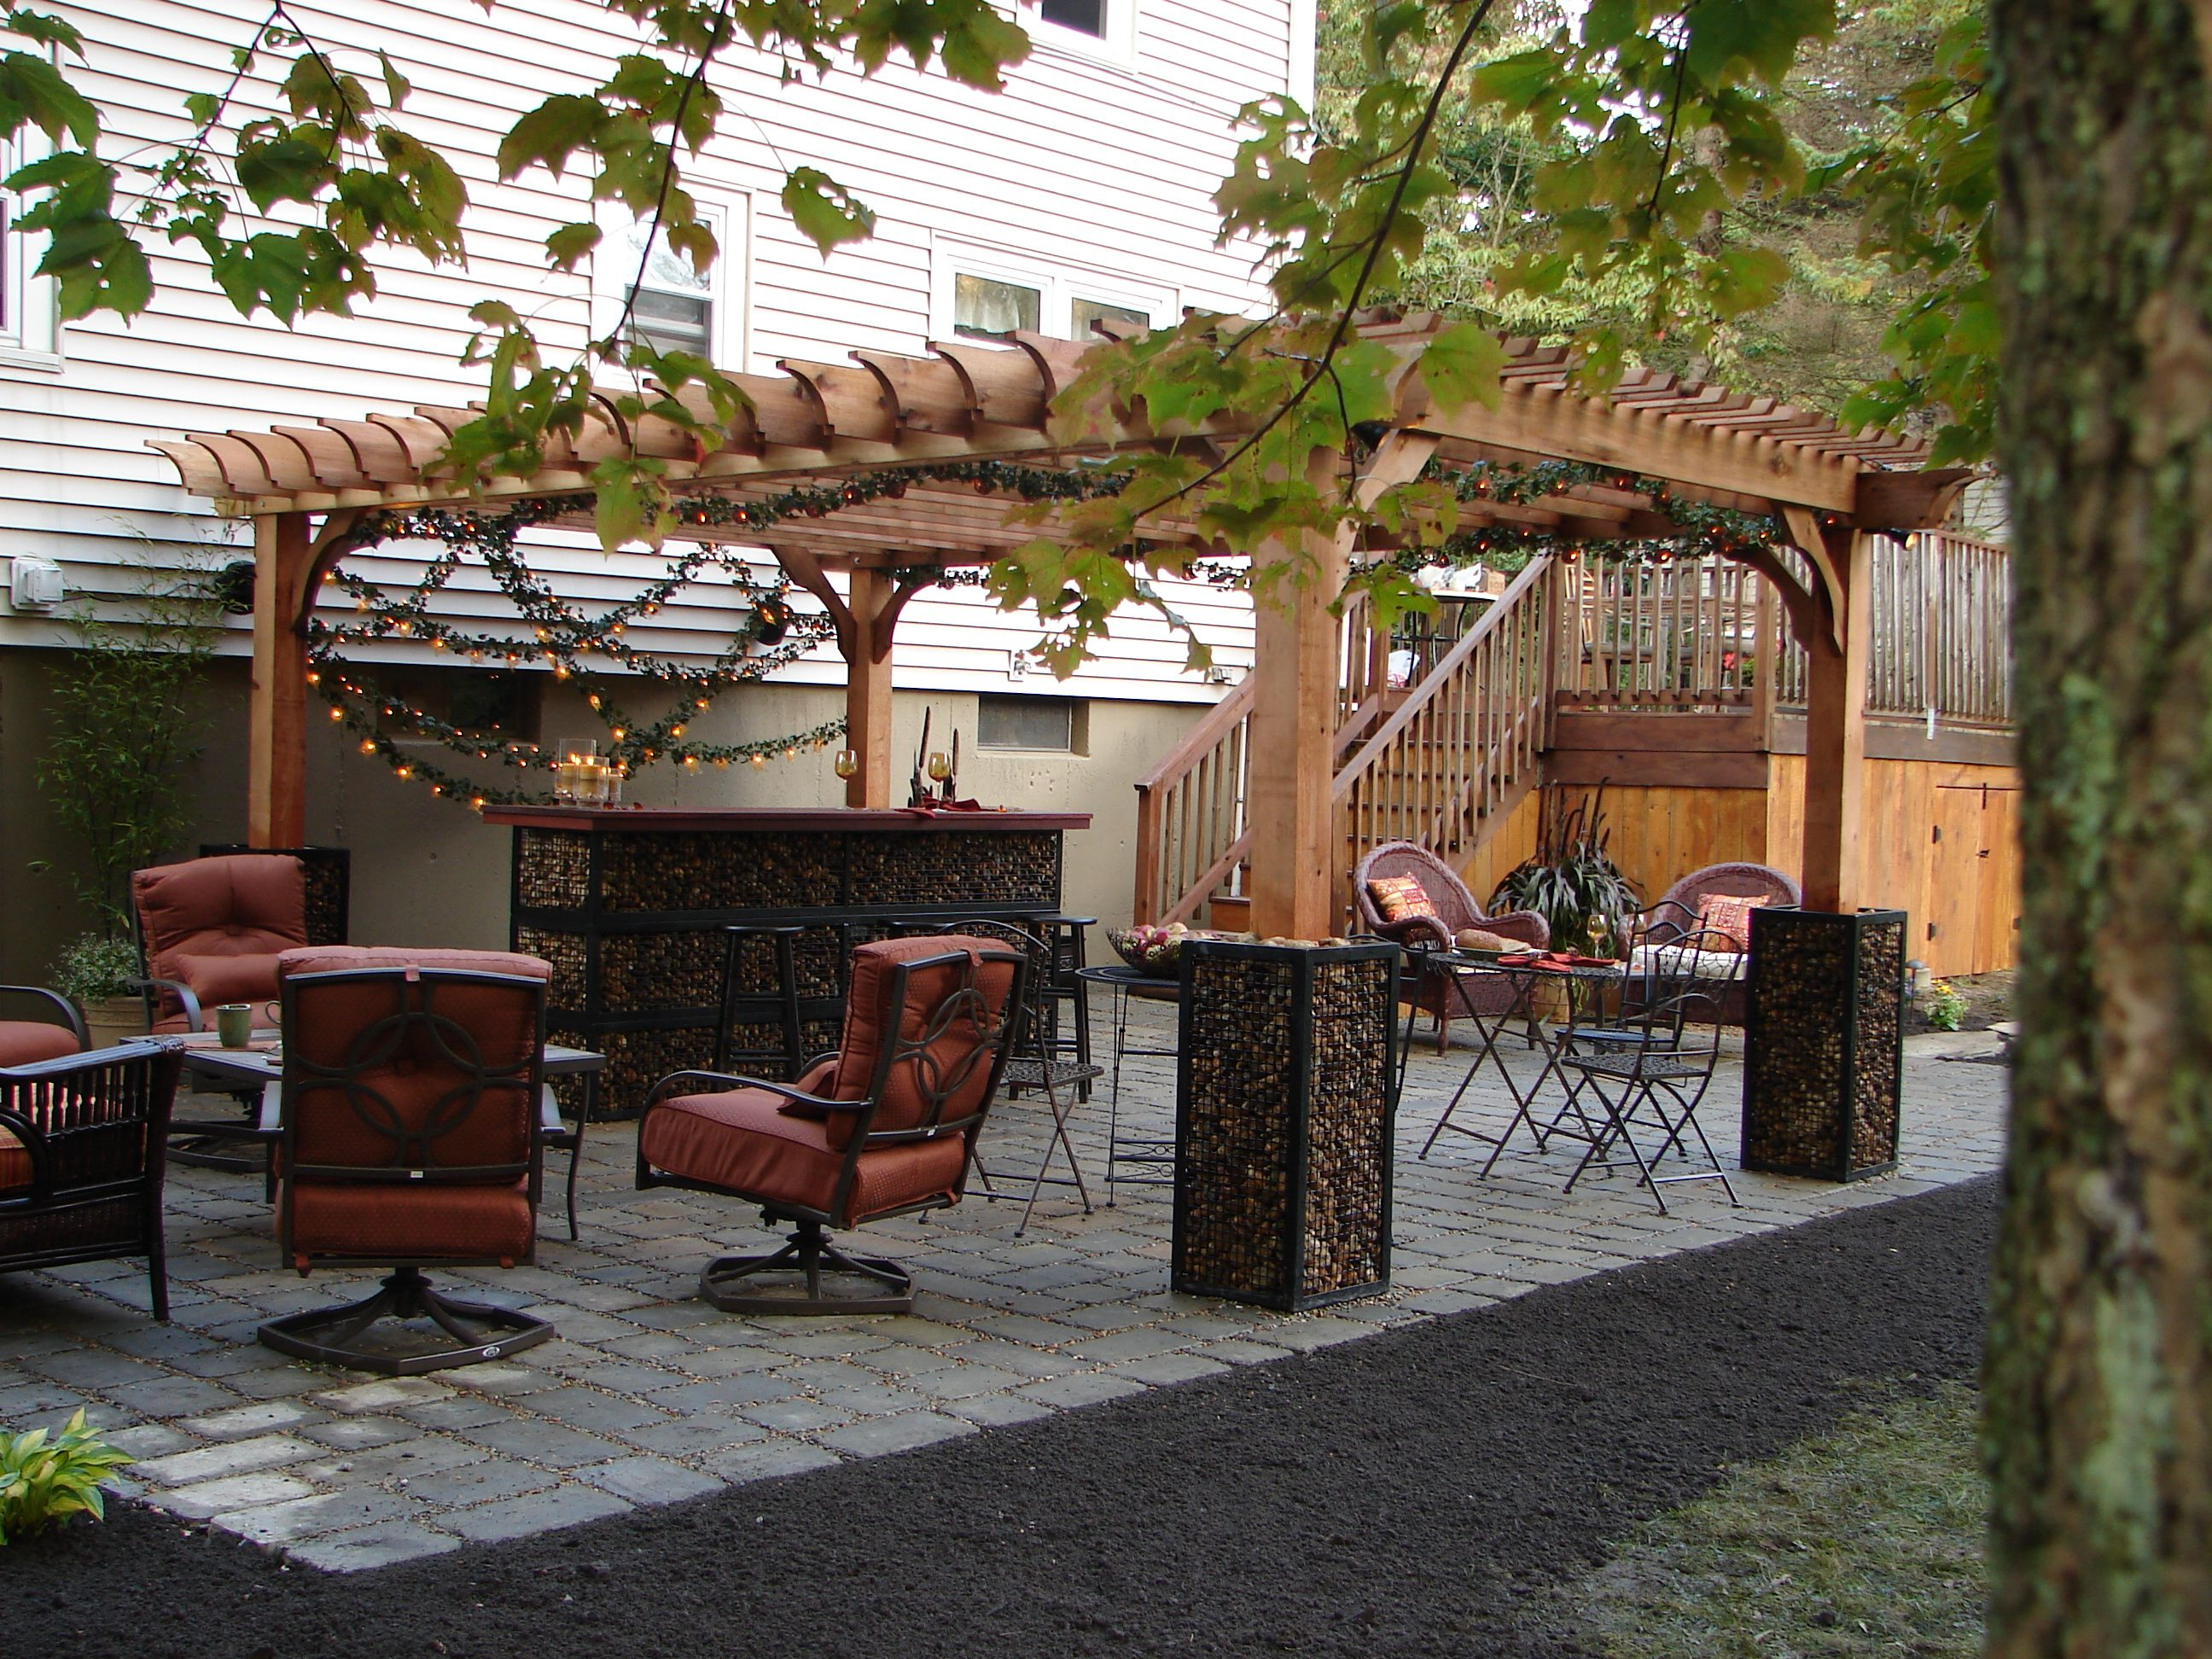 Pin By Pergola Depot On Pergola Kits Featured On Diy Network Rustic Pergola Diy Pergola Garage Pergola